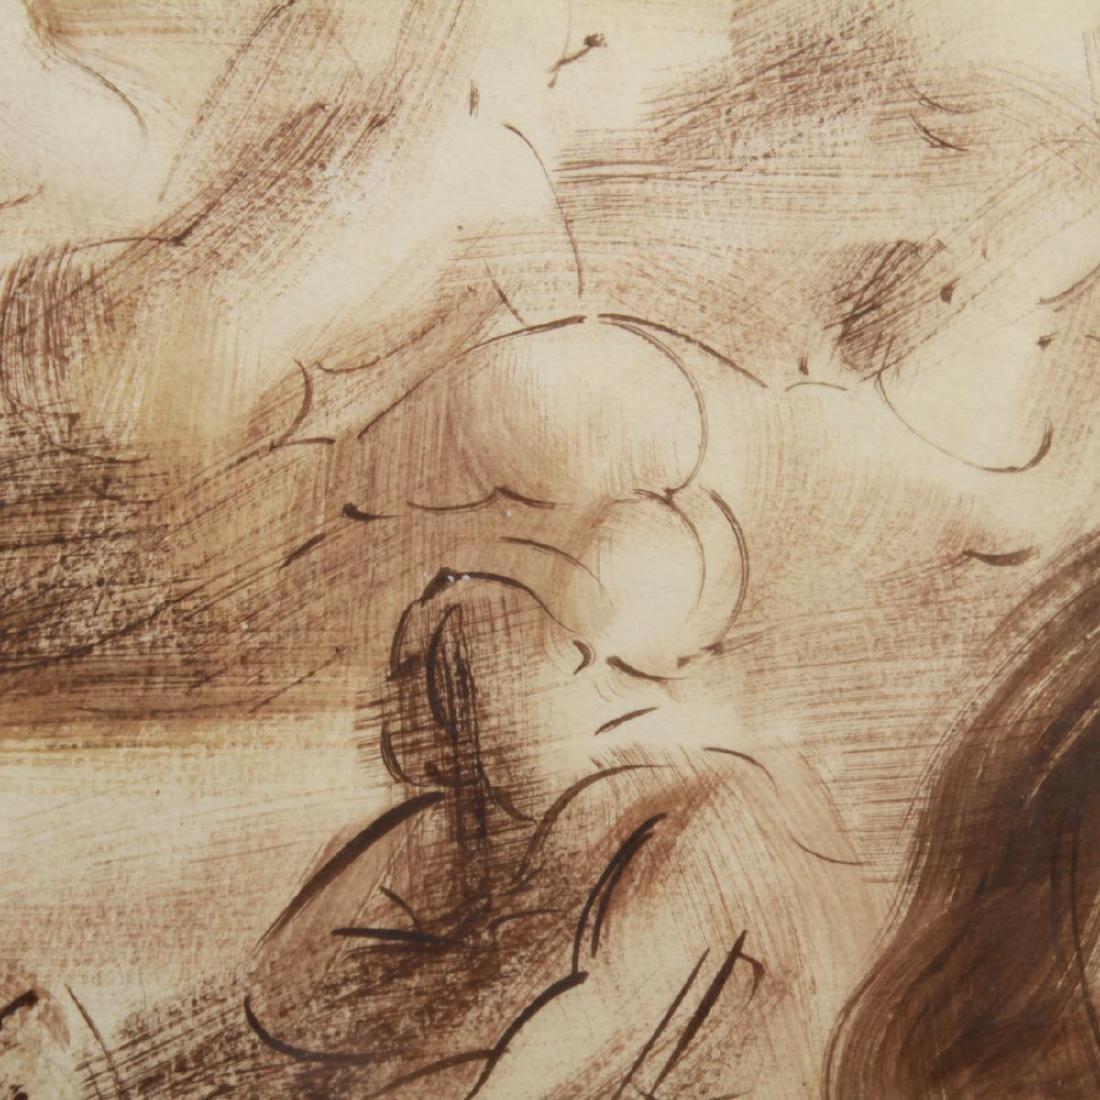 Reginald Marsh (attrib.) Figures, Oil on Paper - 4